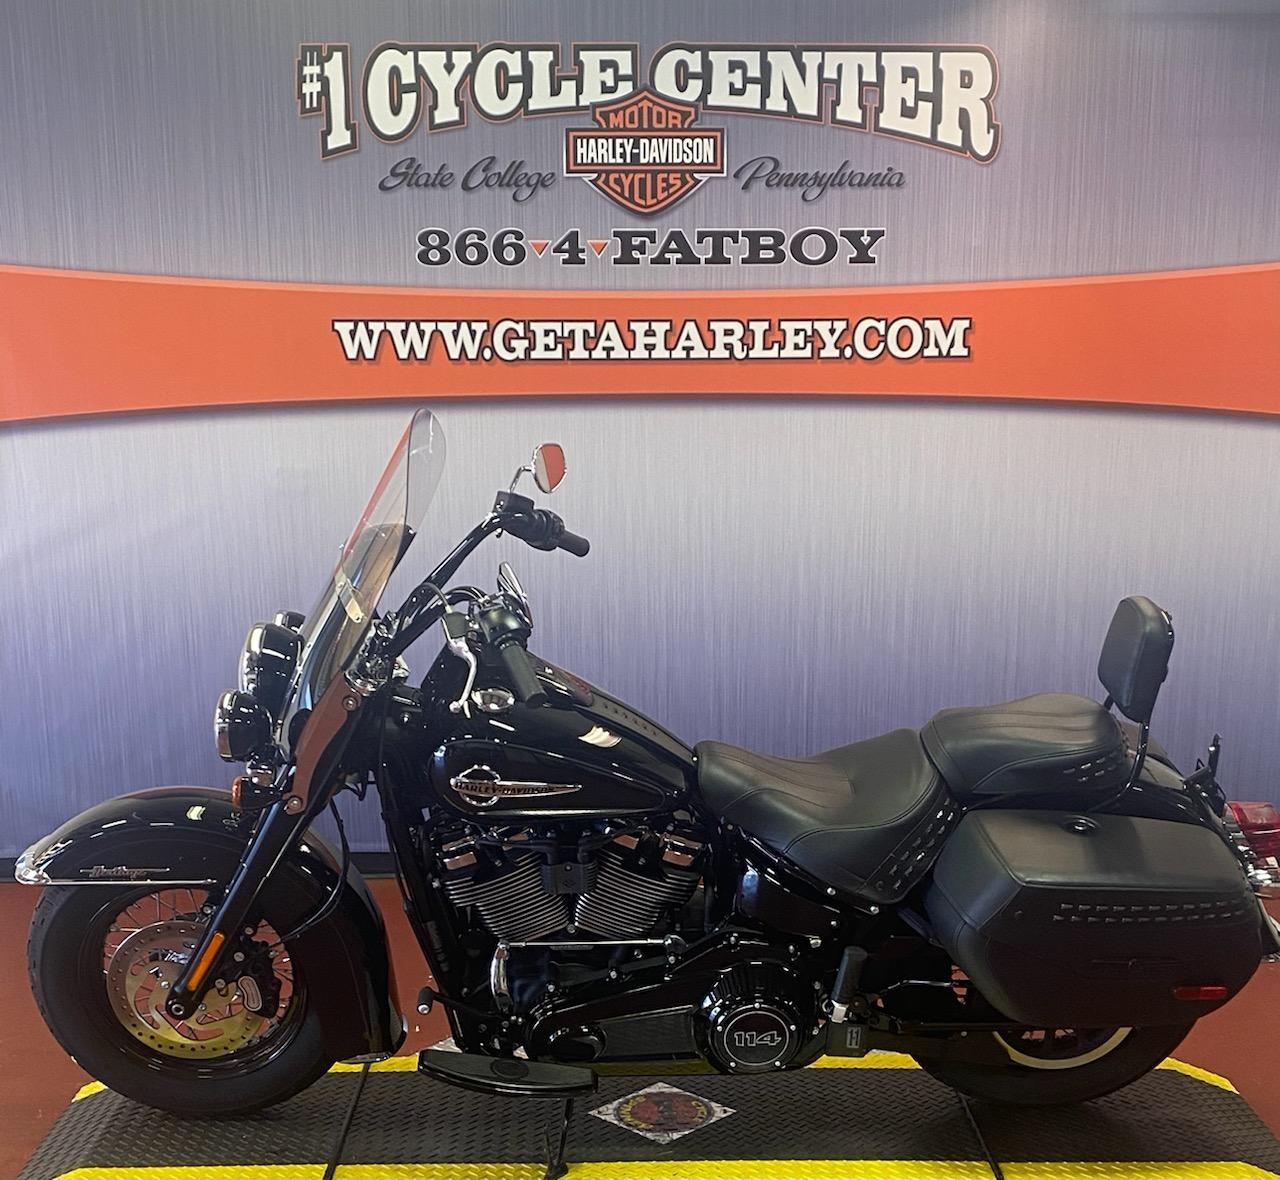 2019 Harley-Davidson Softail Heritage Classic 114 at #1 Cycle Center Harley-Davidson